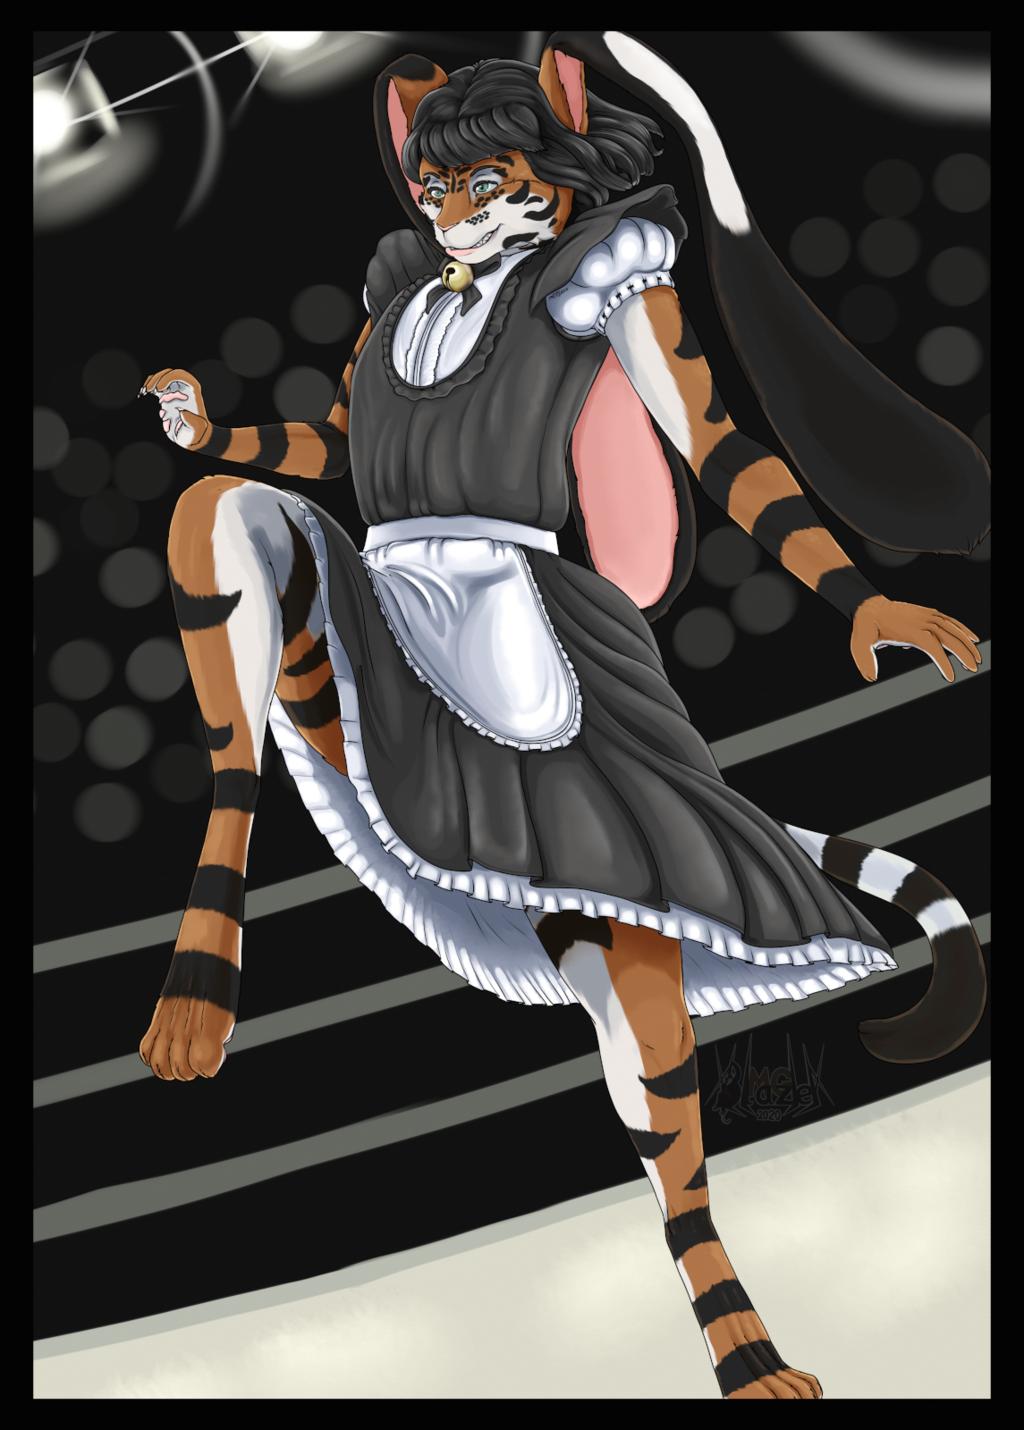 Most recent image: [c] - Cabbit Fighter Maid